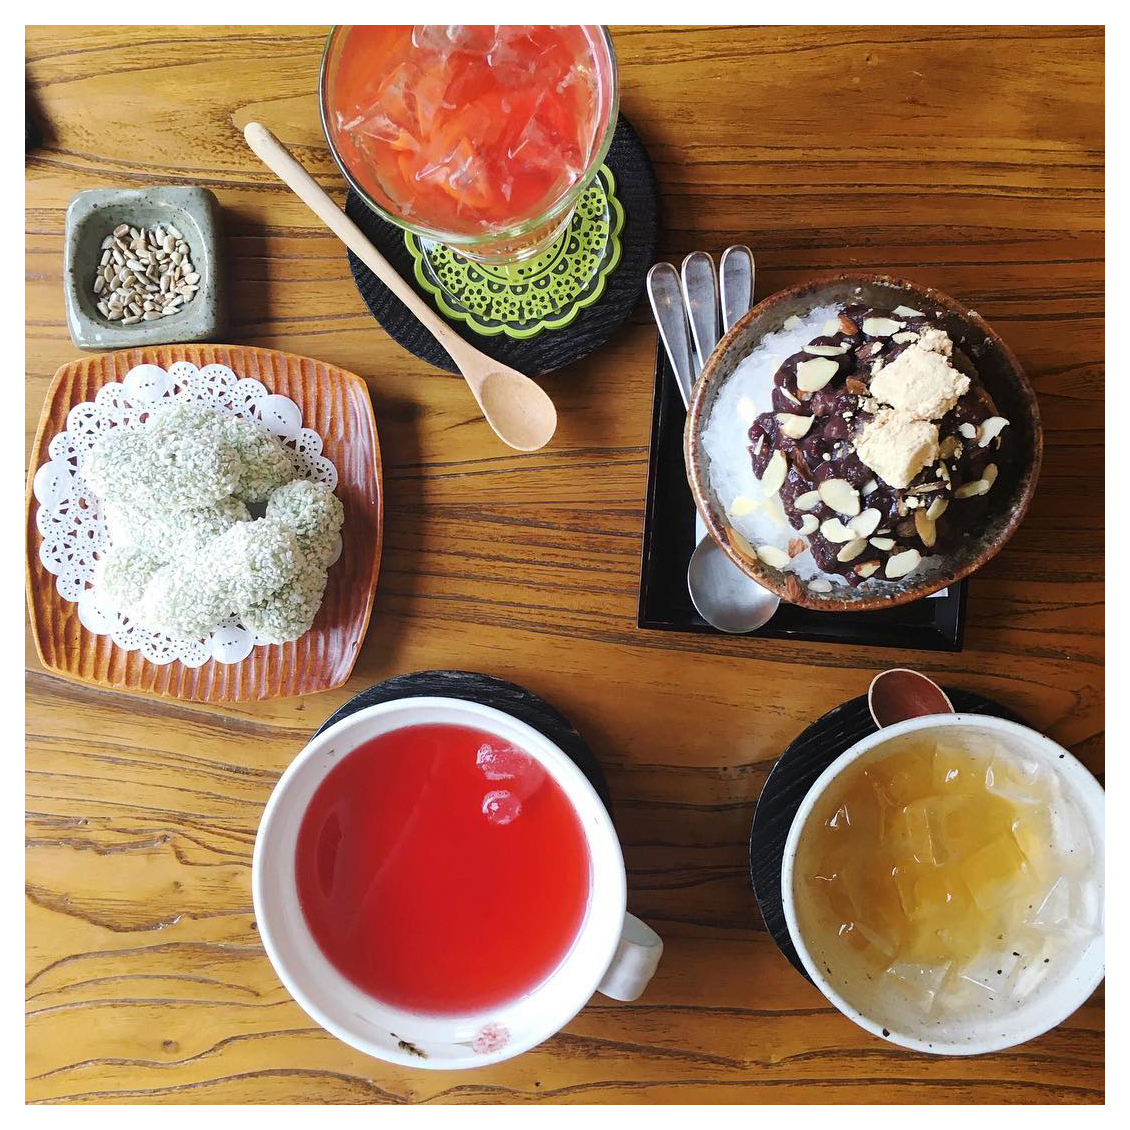 korea travel guide, seoul travel guide, seoul, korea, bukcheon, hanok village, insadong, travel guide, travel, seoul tourism, travel blog, and other stories, vintage style, retro style, tea house, traditional tea, korean tea, omija tea, hangwa